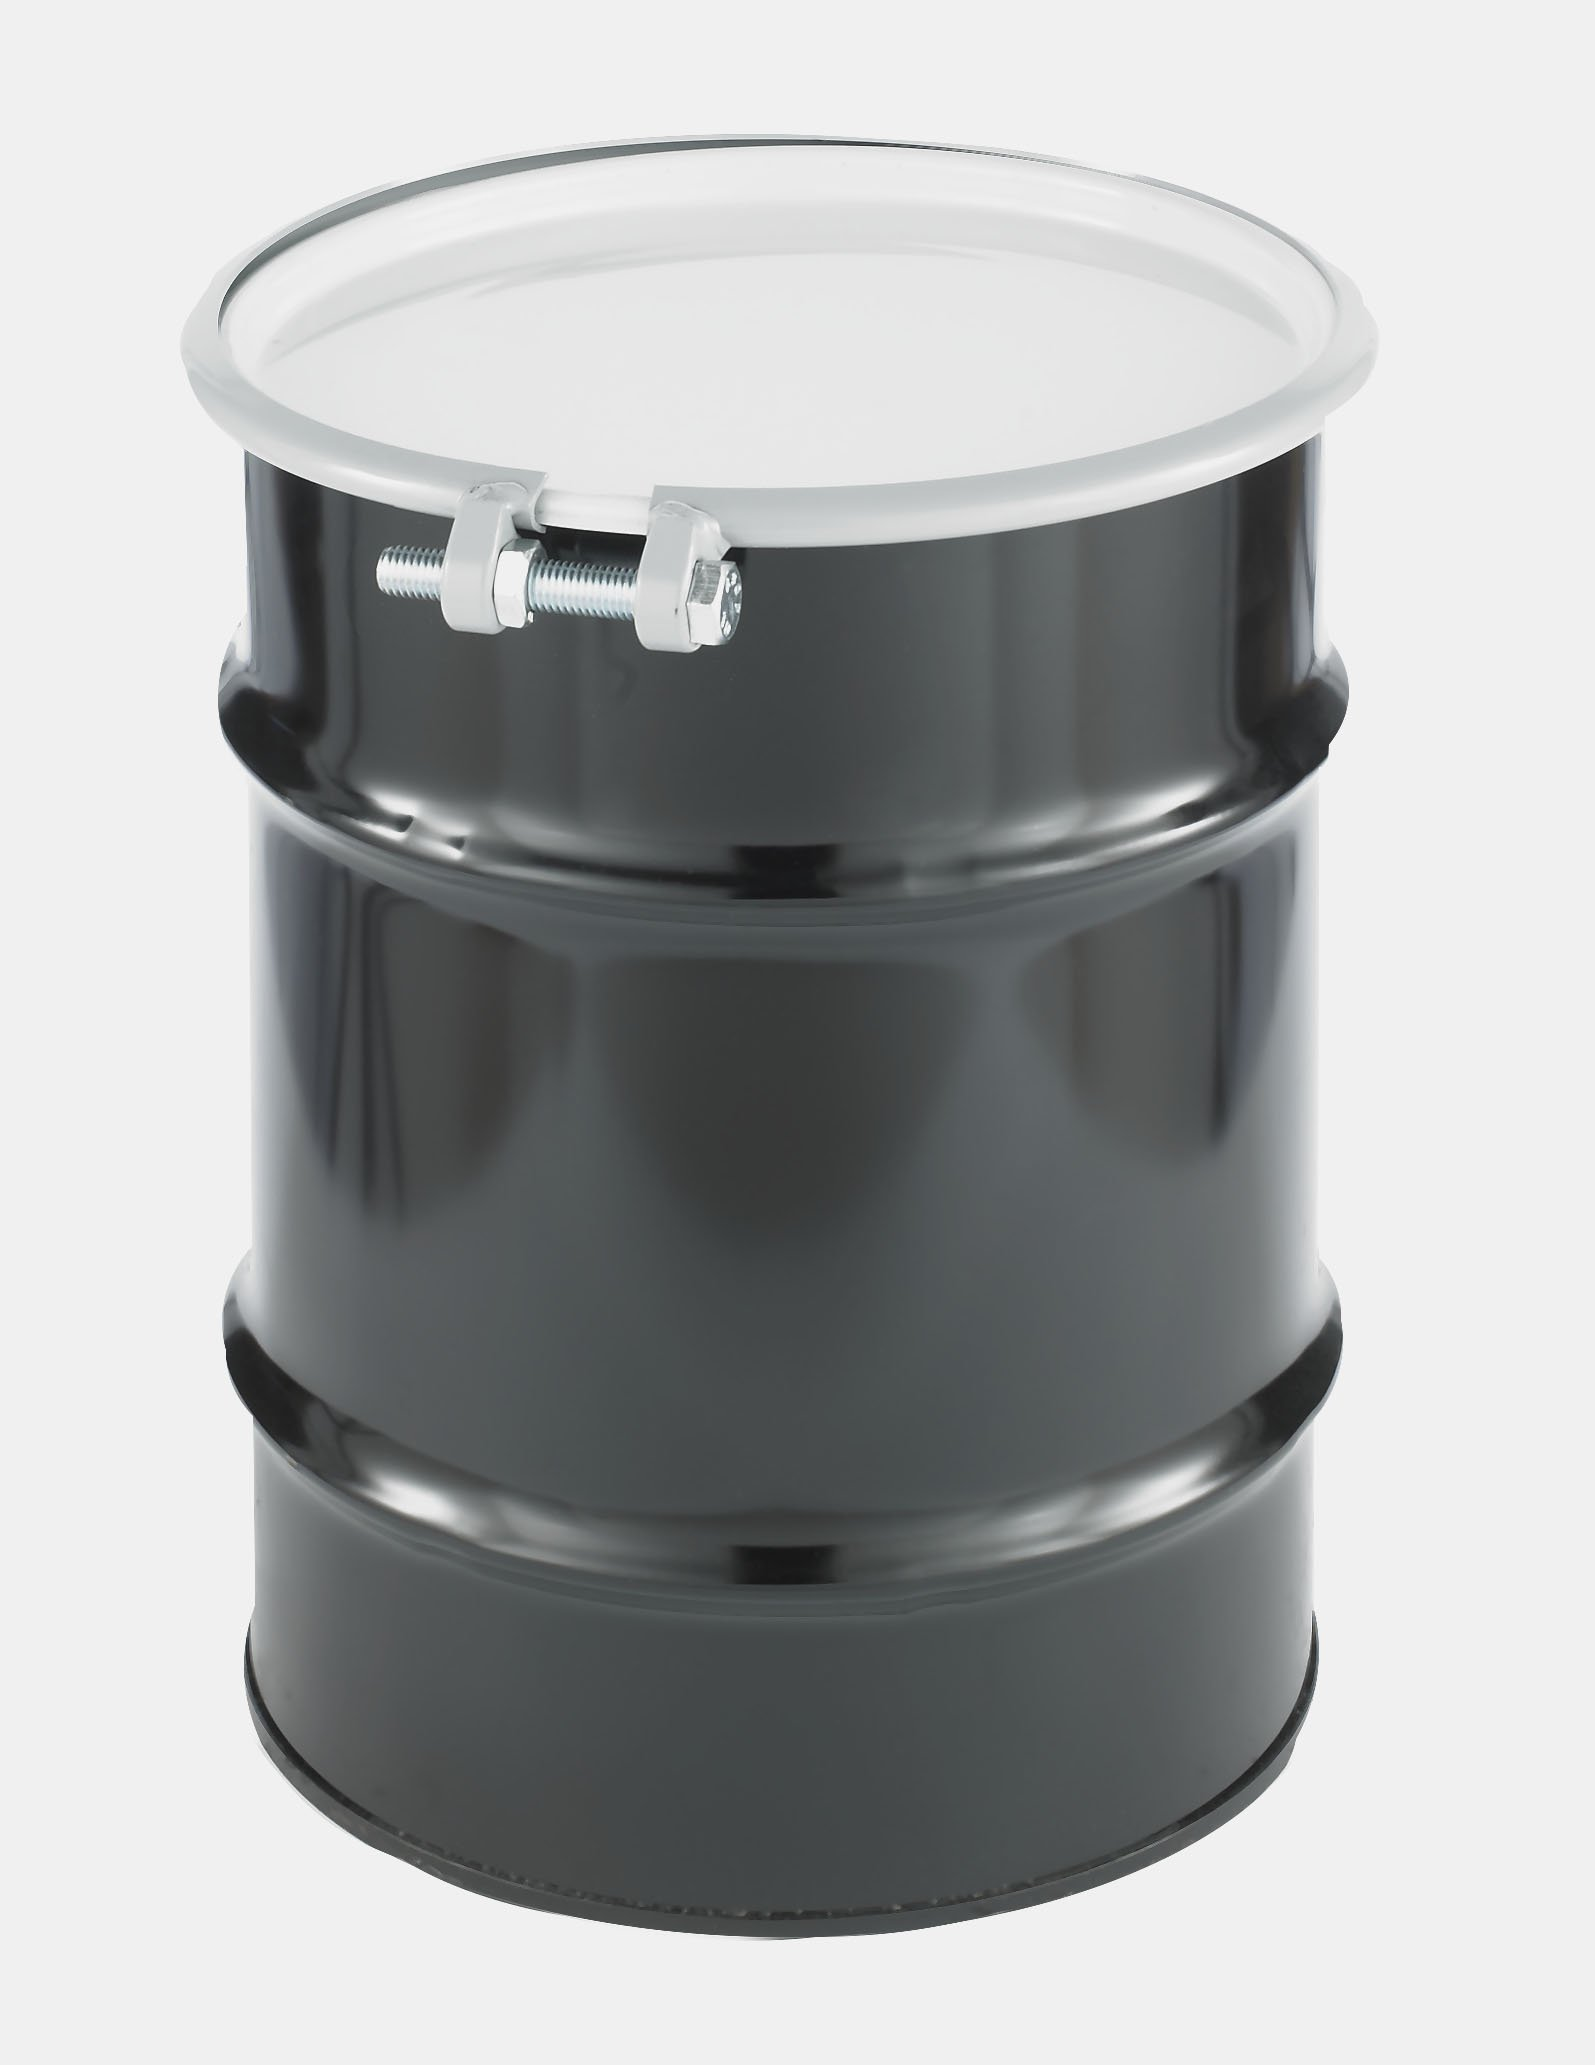 SKOLNIK Carbon Steel Open Head Drum, 10 gallons, Bolt Ring, 0.9mm Body Gauge (Pack of 1) by Skolnik